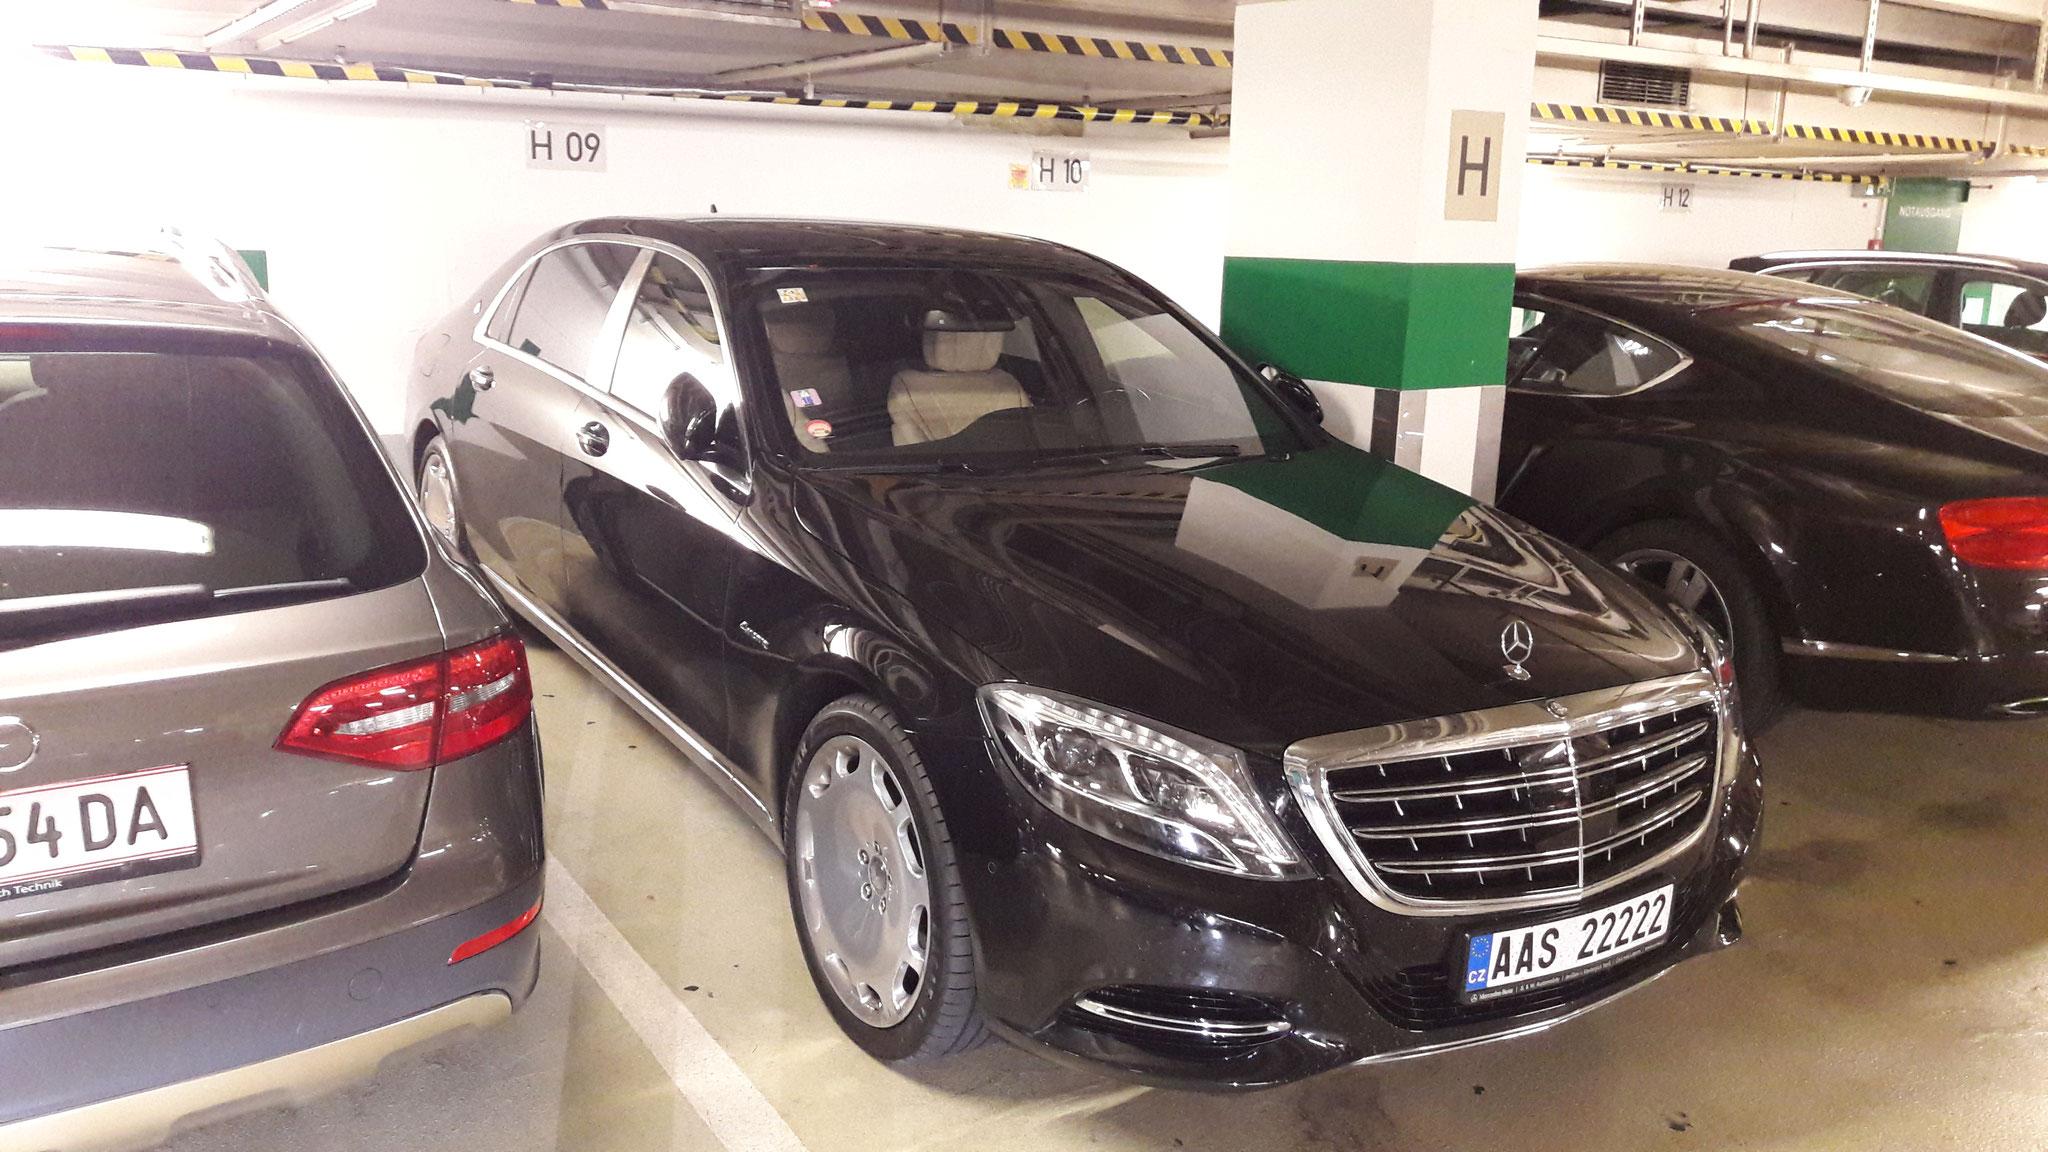 Mercedes Maybach AAS-22222 (CZ)